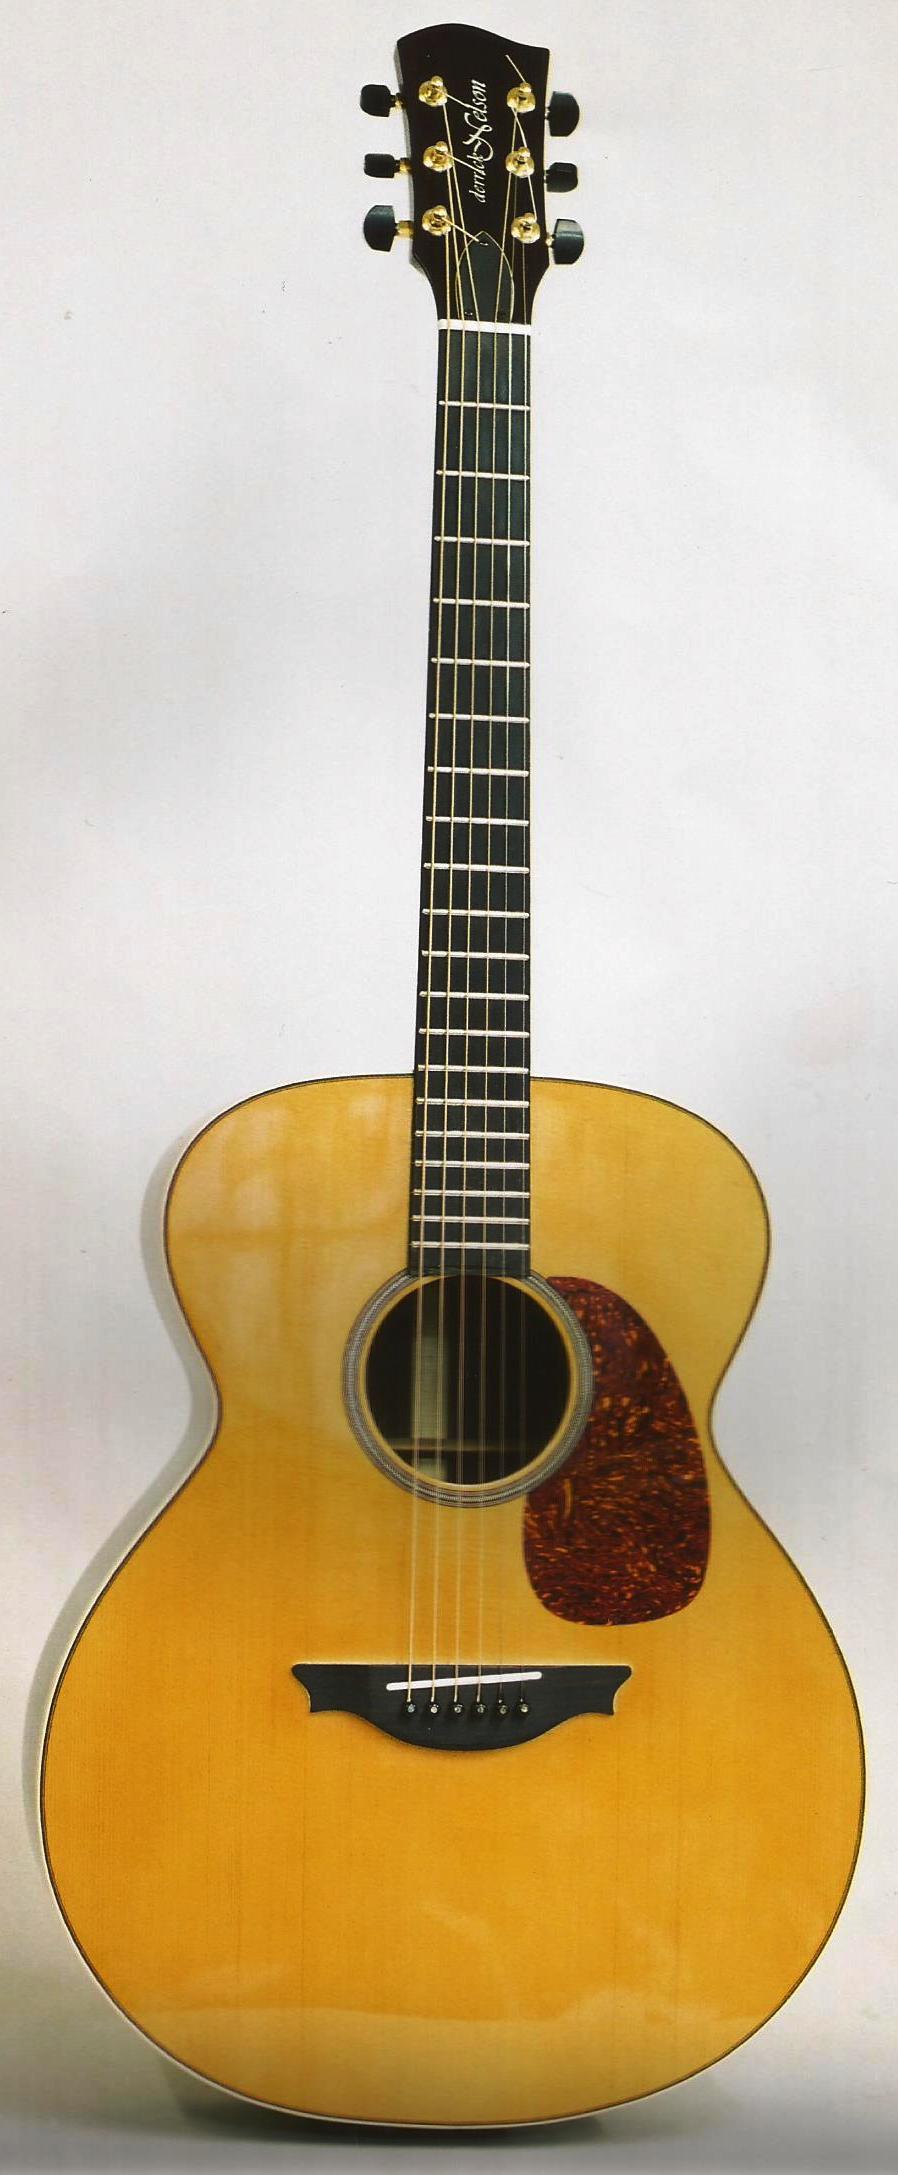 Danvel Jumbo Steel String Guitar